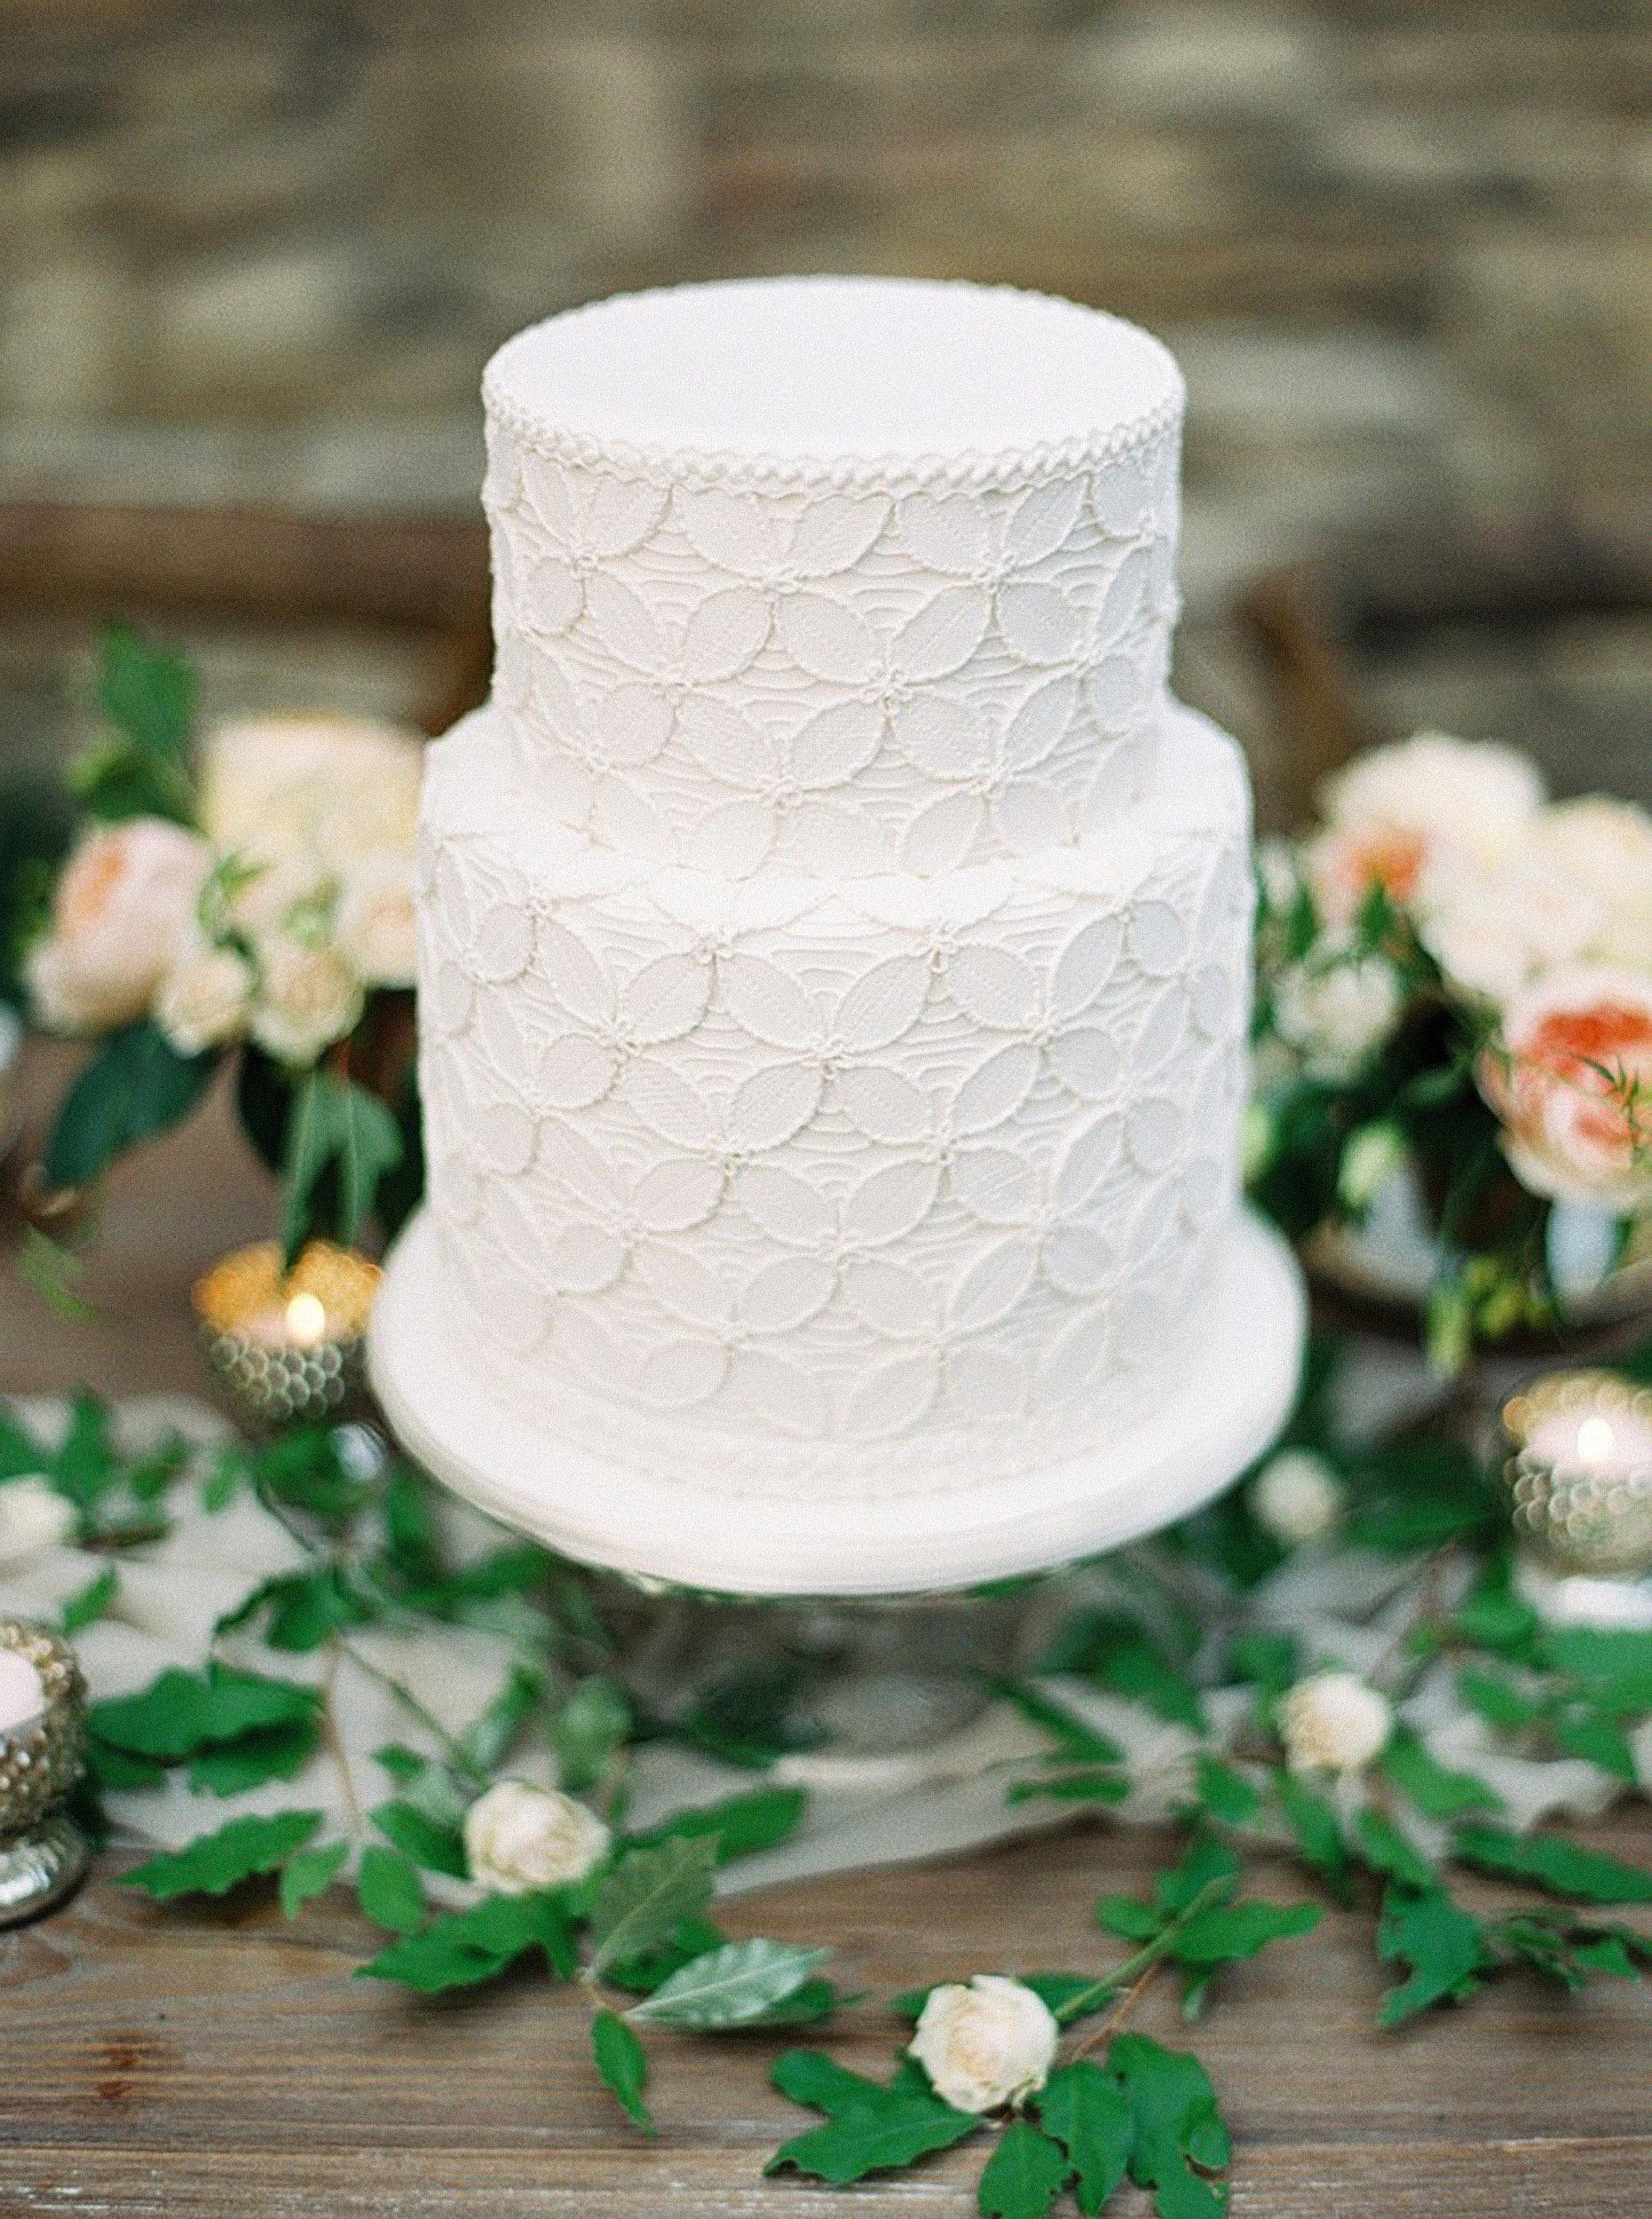 cake designs blaine siesser